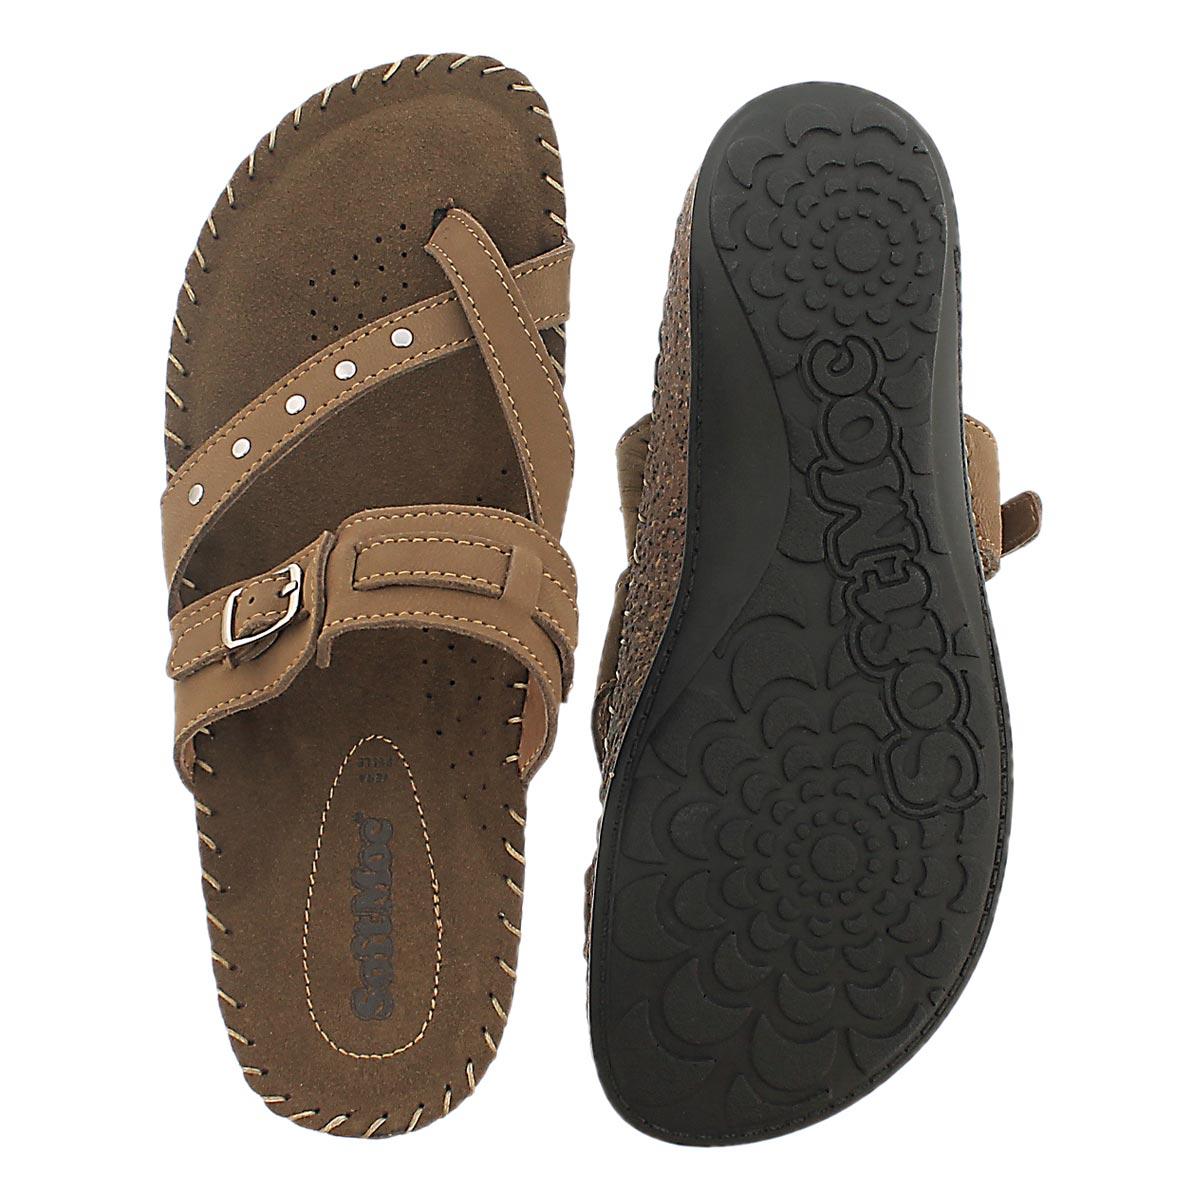 Lds Tammy 2 chestnut memory foam sandal